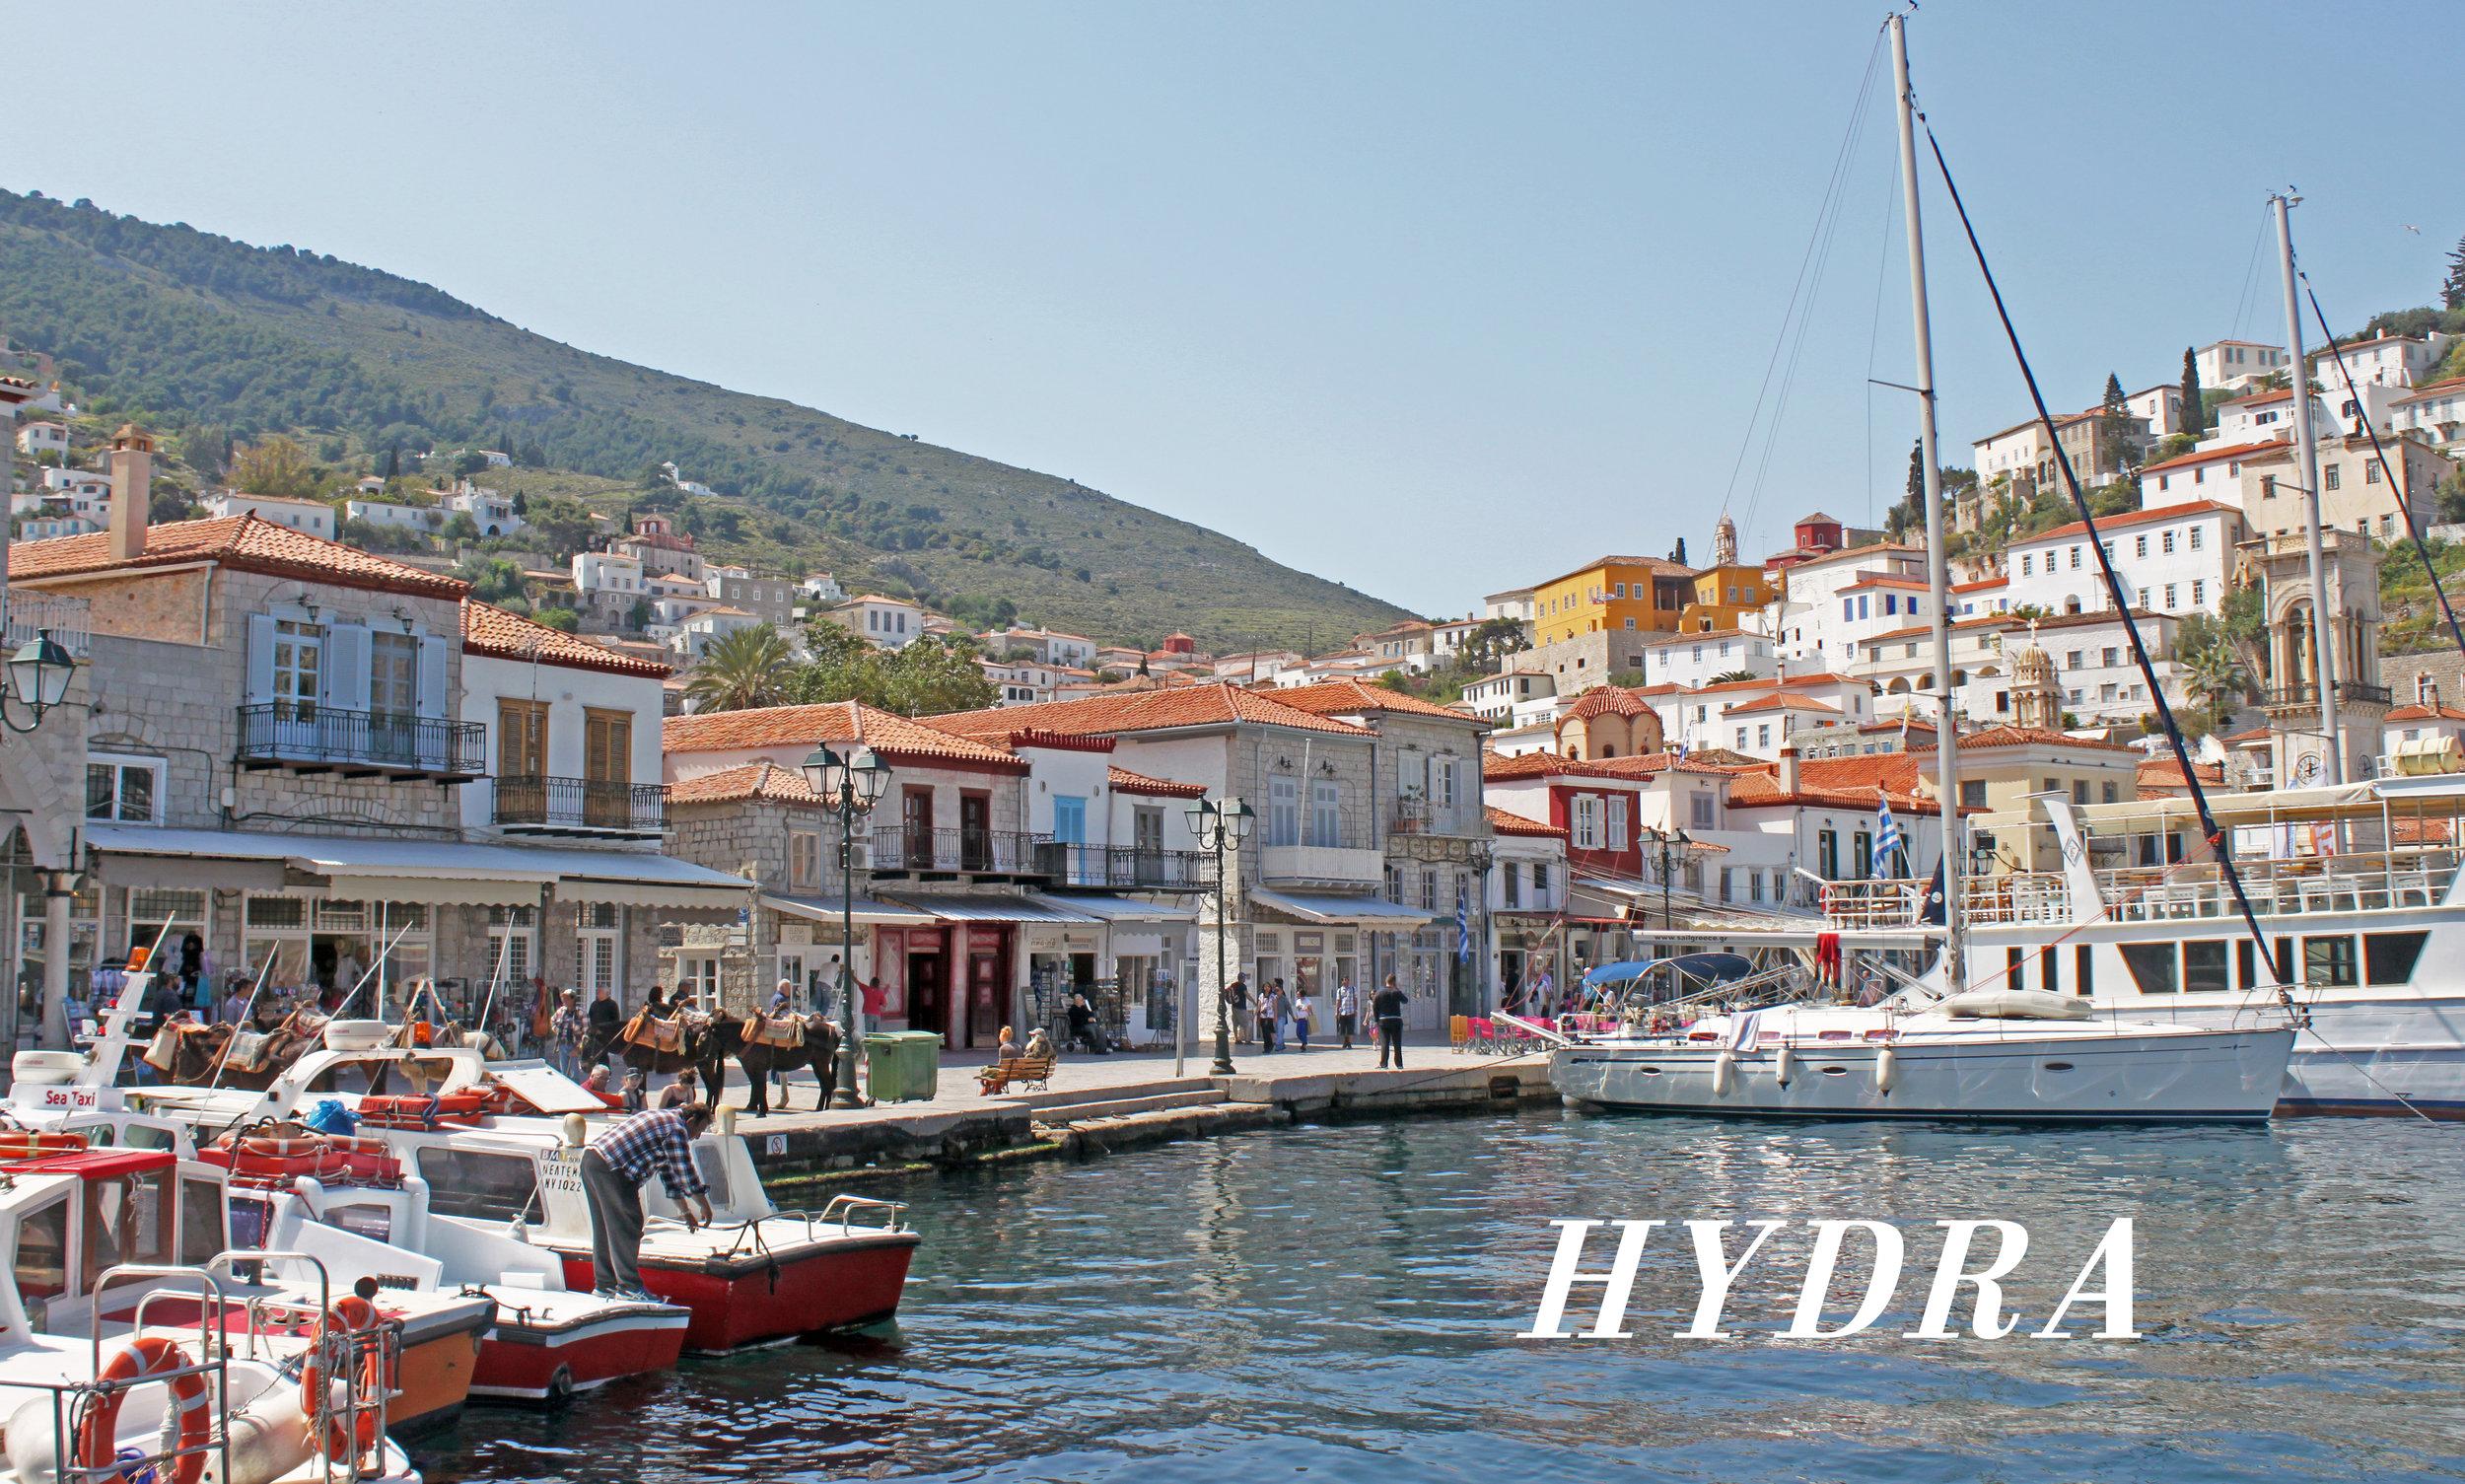 Hydra port.jpg